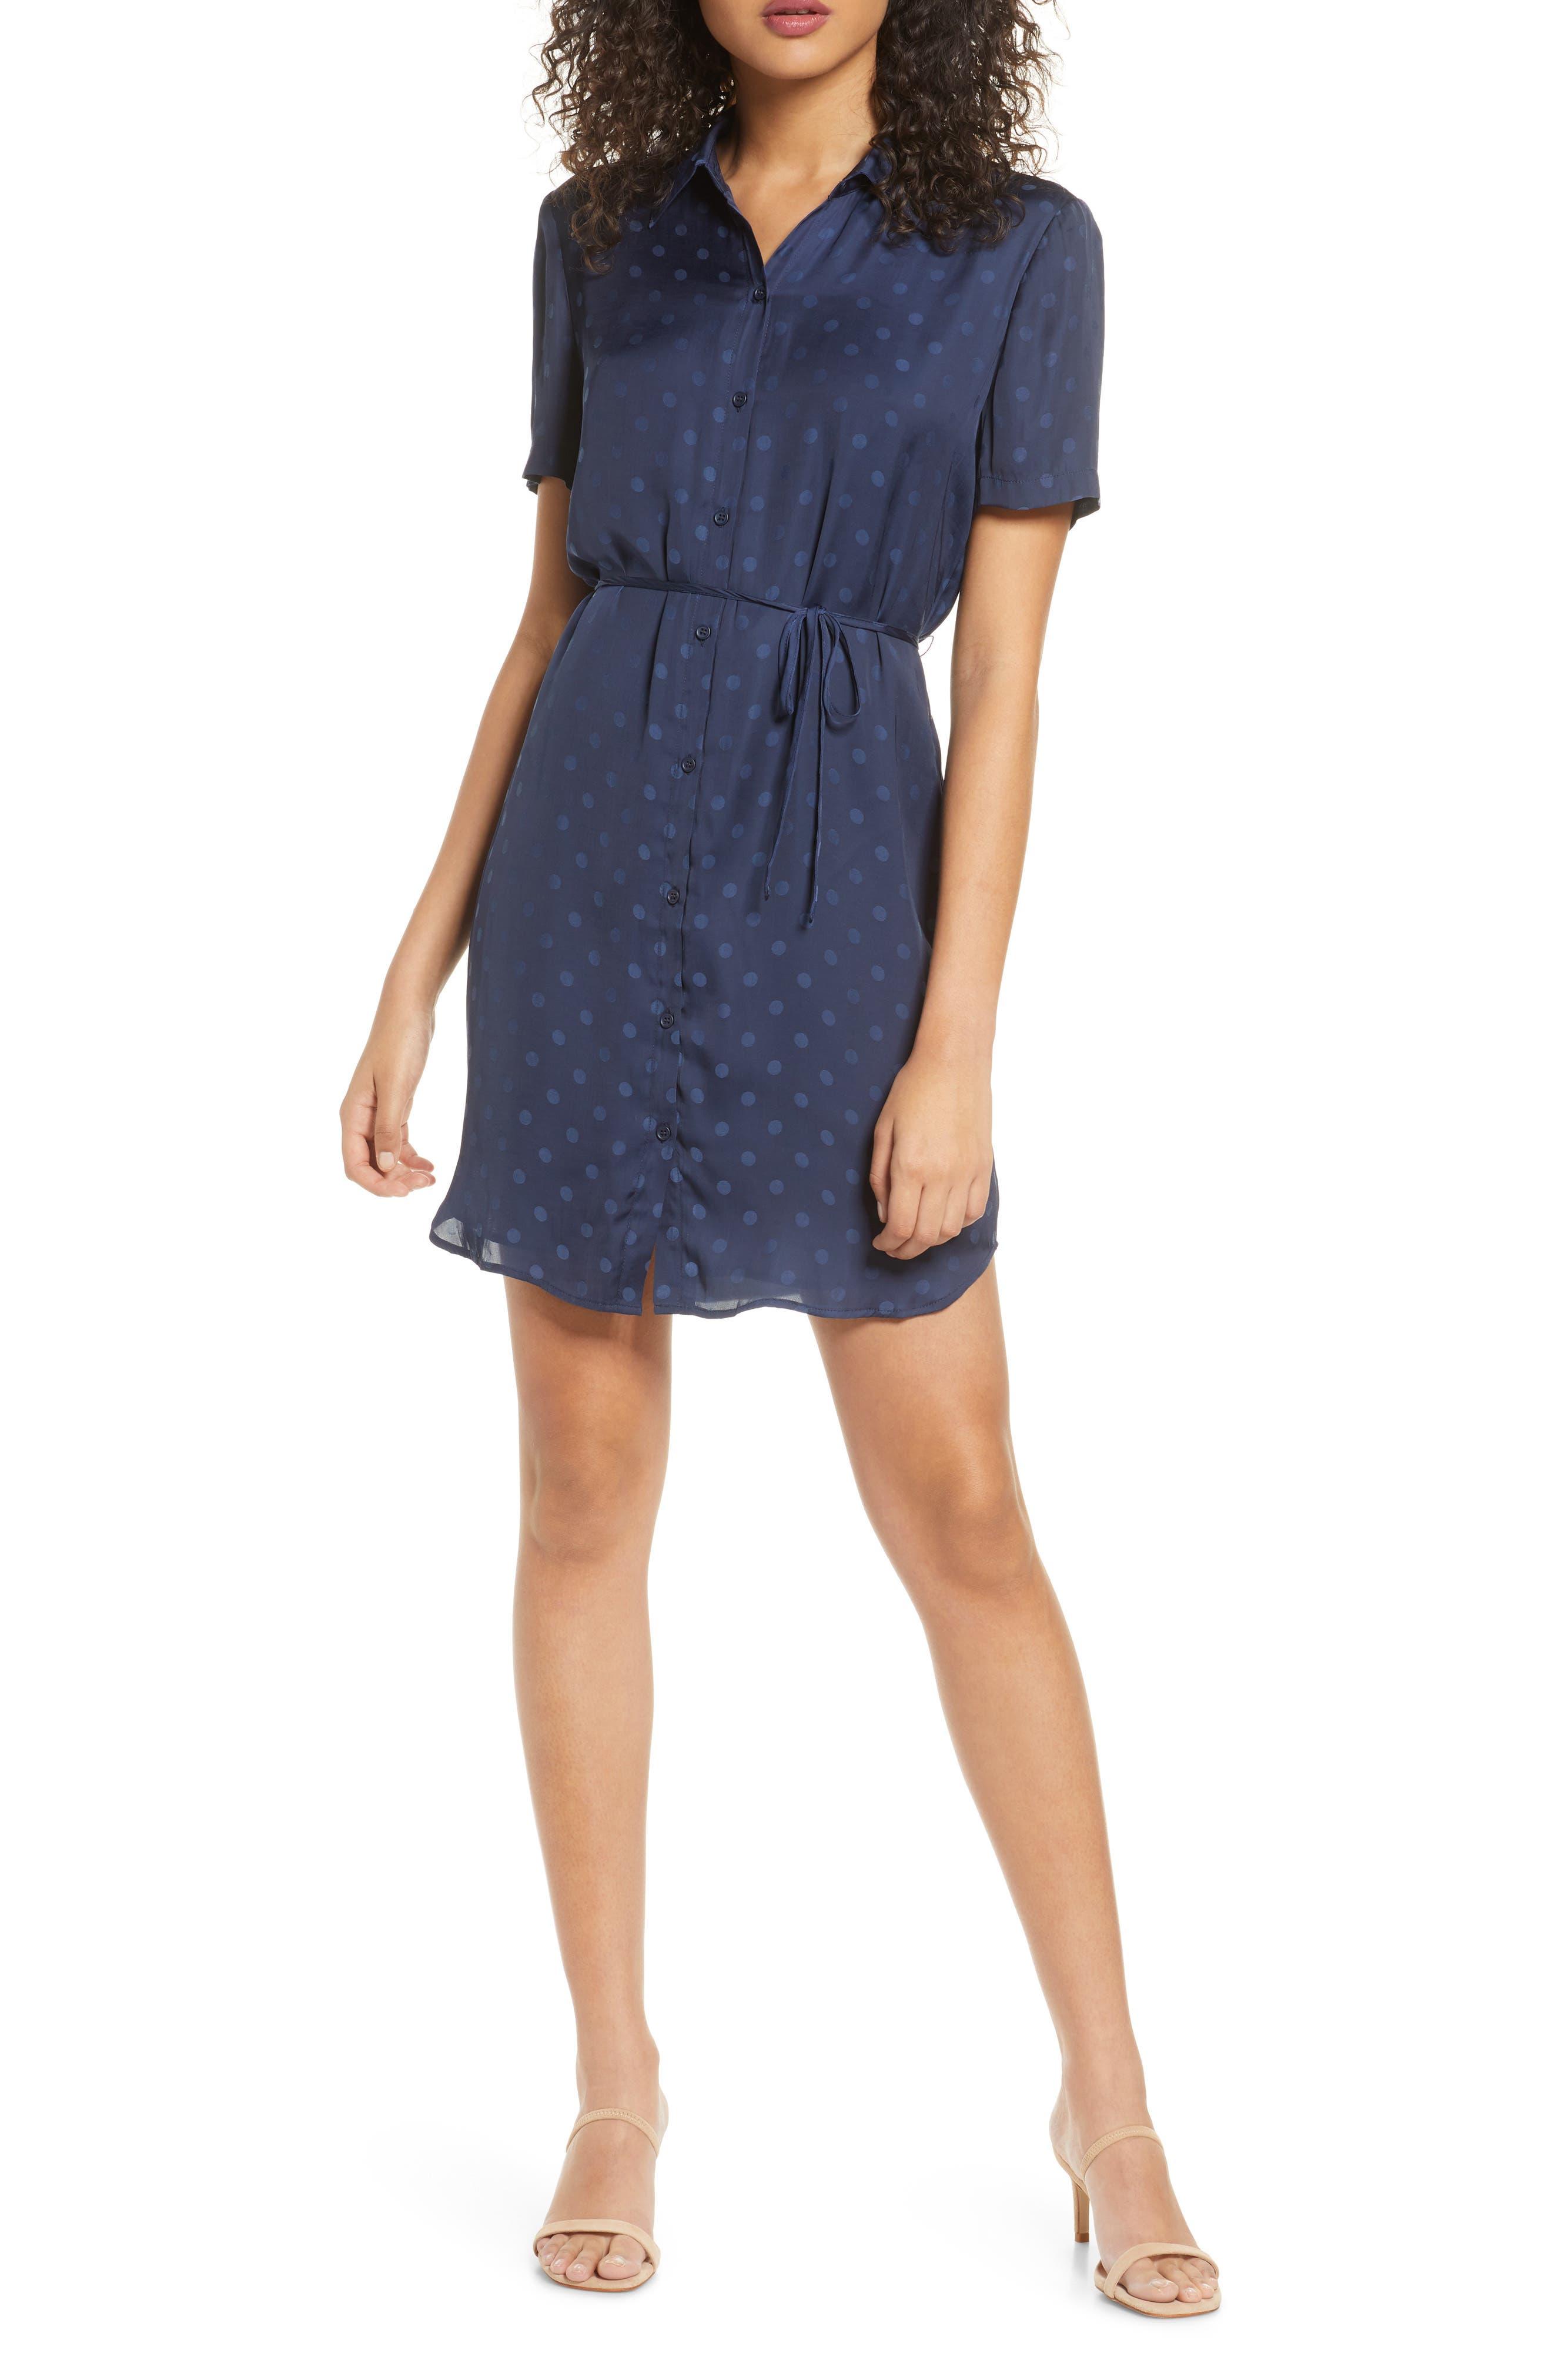 Image of BB Dakota Dot Jacquard Shirt Dress